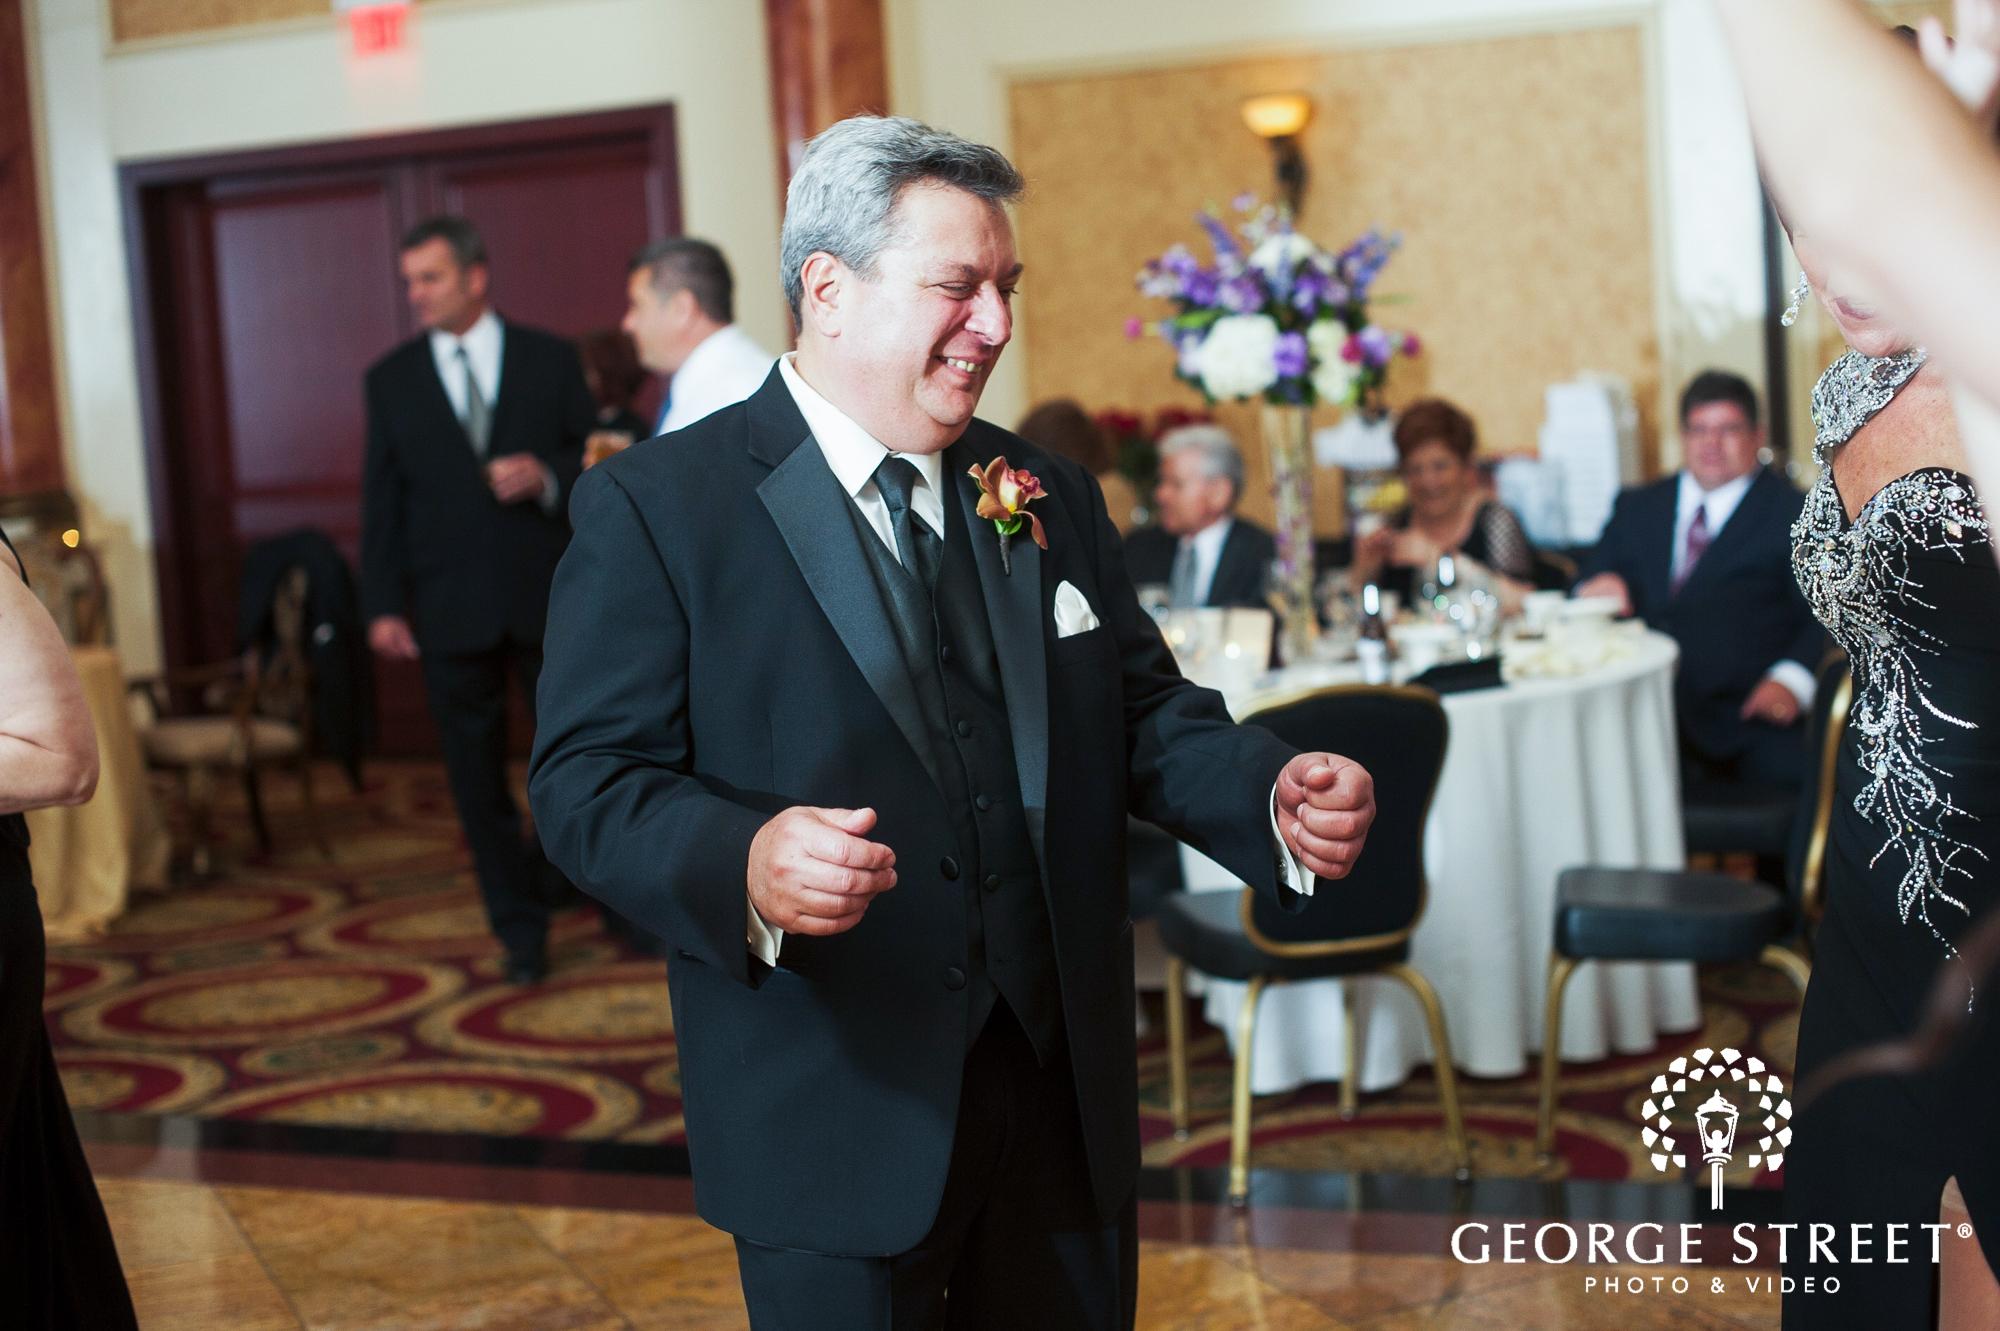 The Merion Wedding Photographer George Street Photo Amp Video